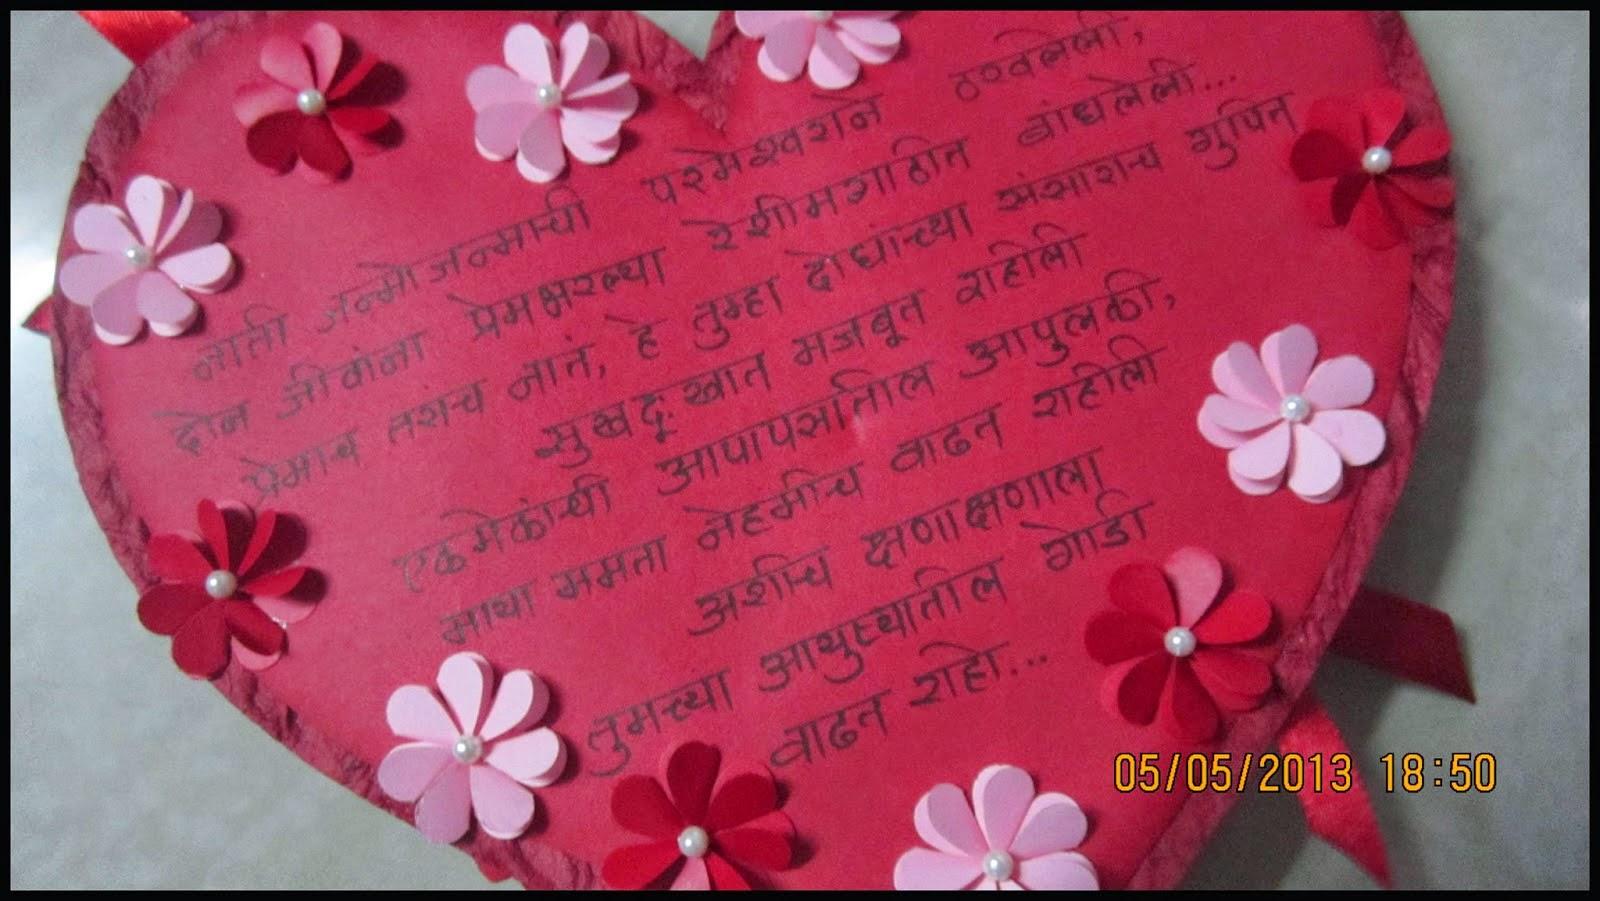 Marriage invitation card in marathi language picture ideas marriage invitation card in marathi language poem wedding invitation image collections party invitations ideas marriage invitation stopboris Gallery